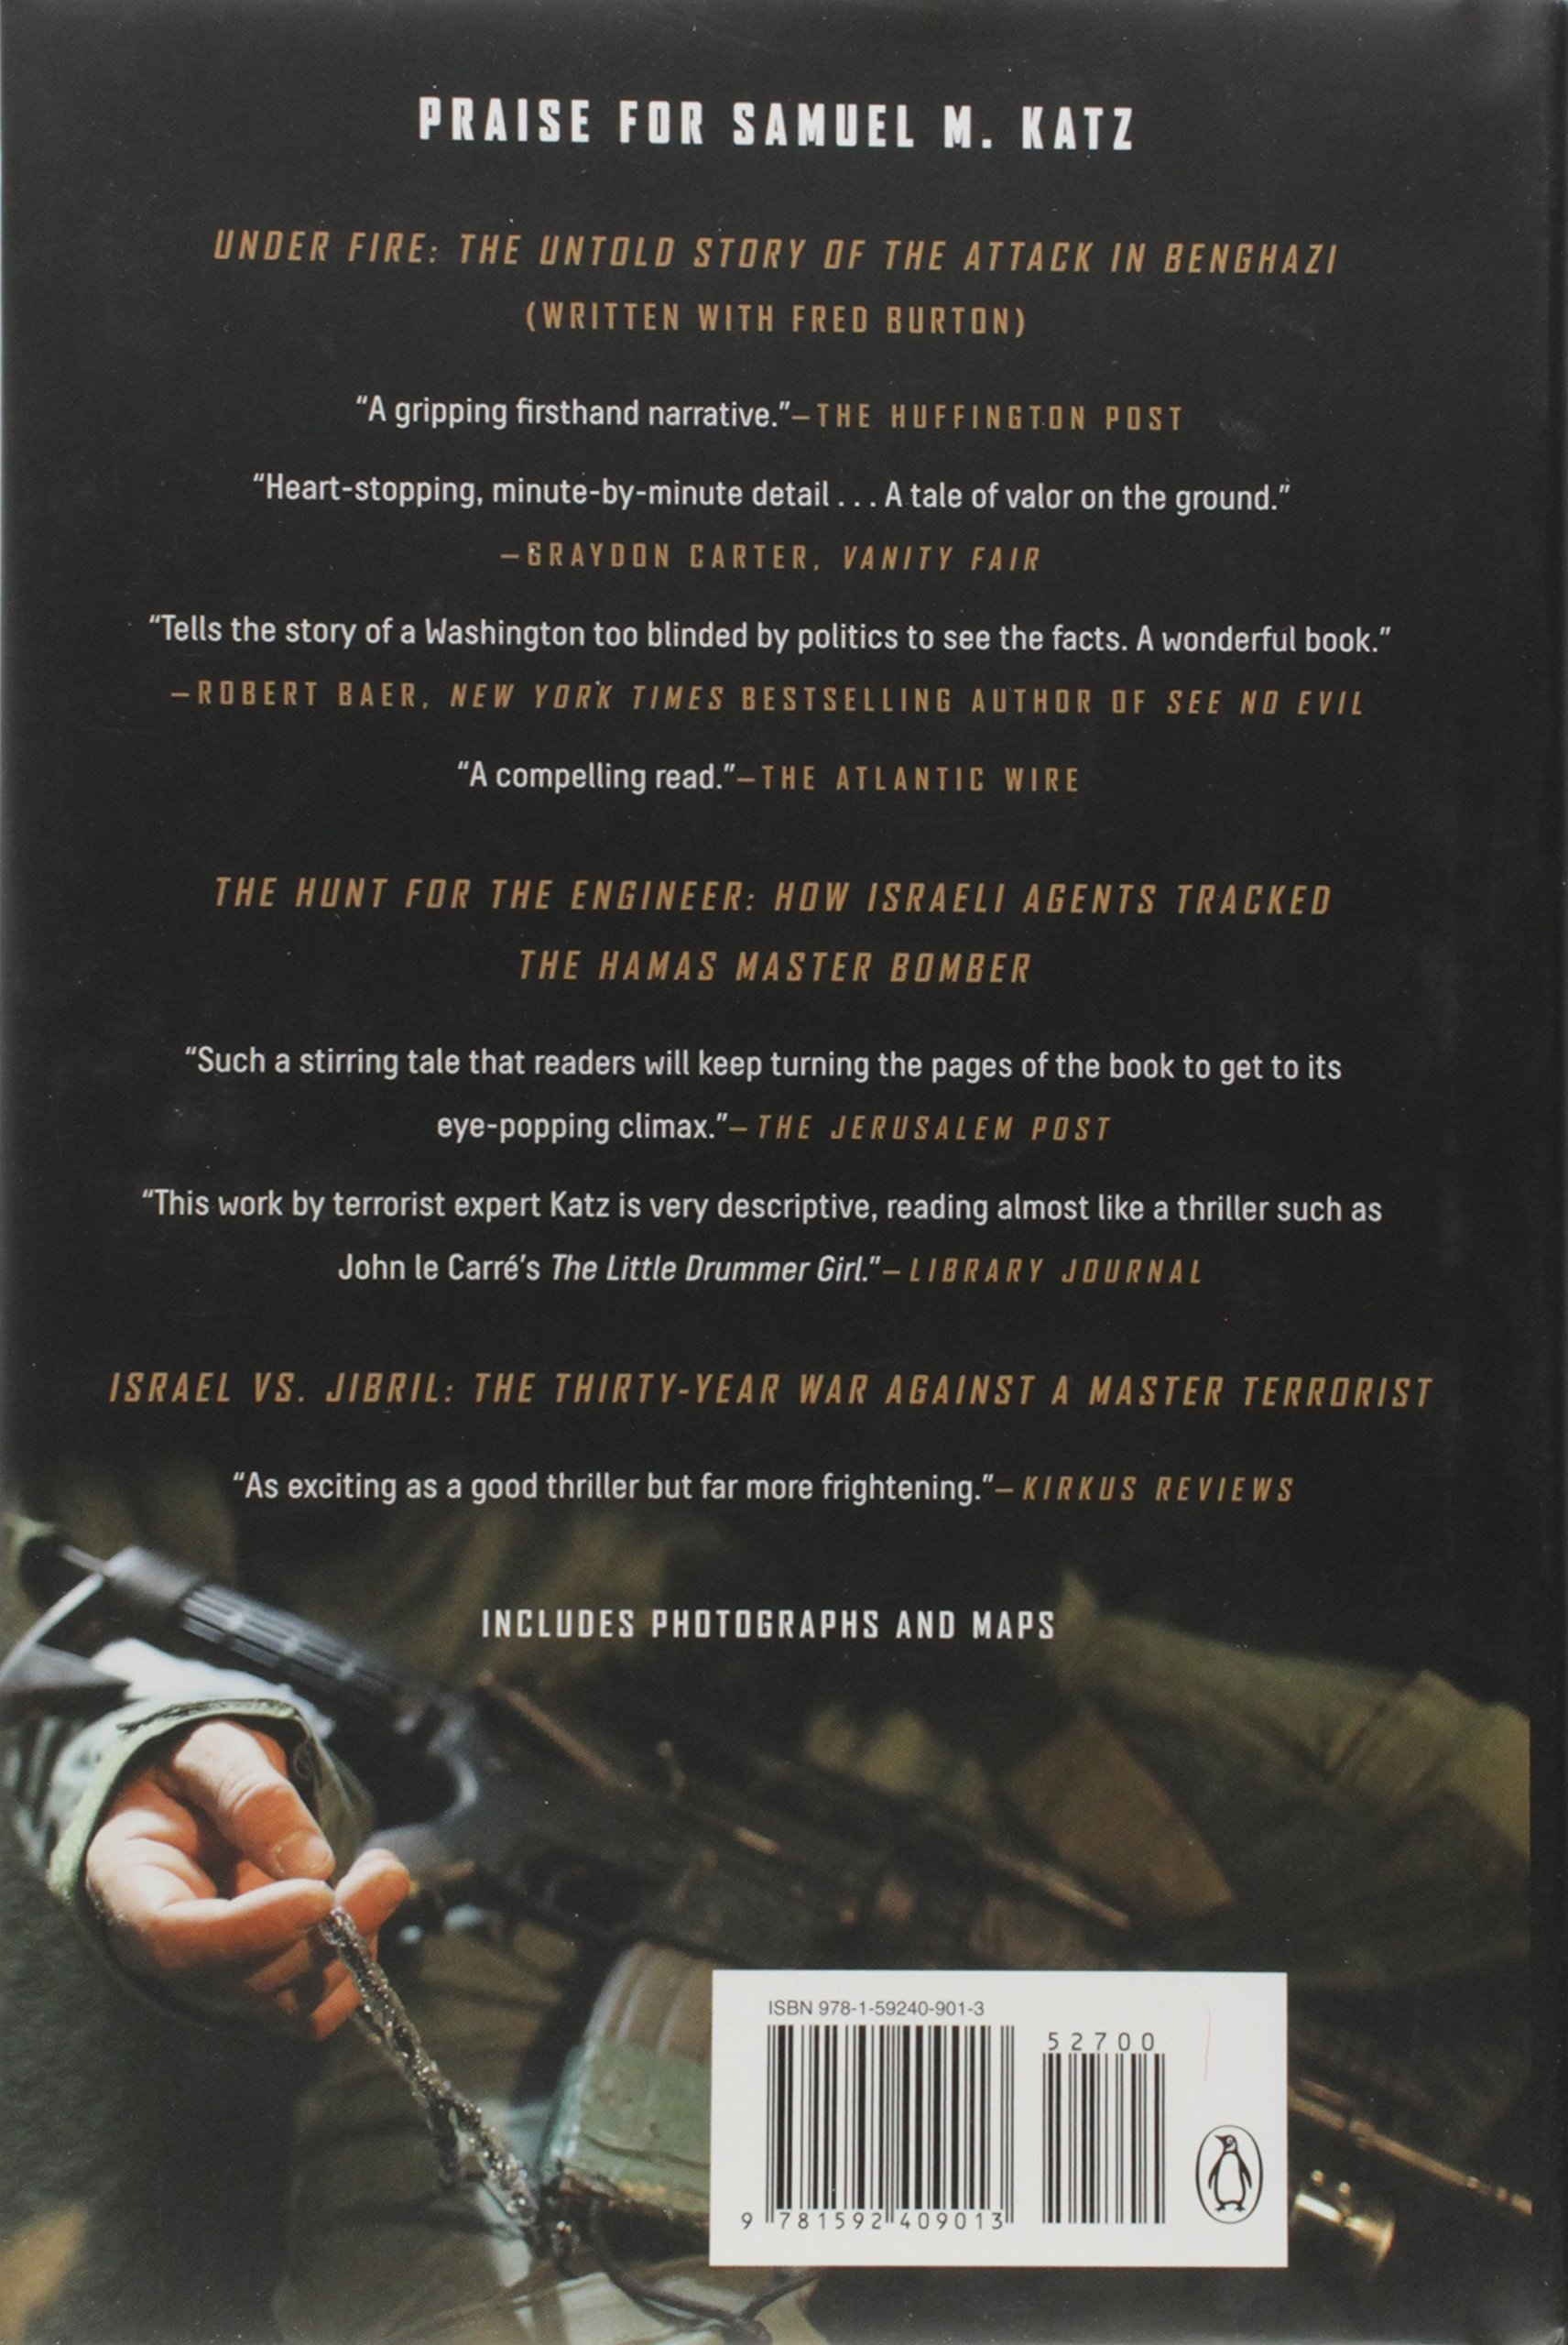 The Ghost Warriors: Inside Israel's Undercover War Against Suicide  Terrorism: Samuel M. Katz: 9781592409013: Amazon.com: Books